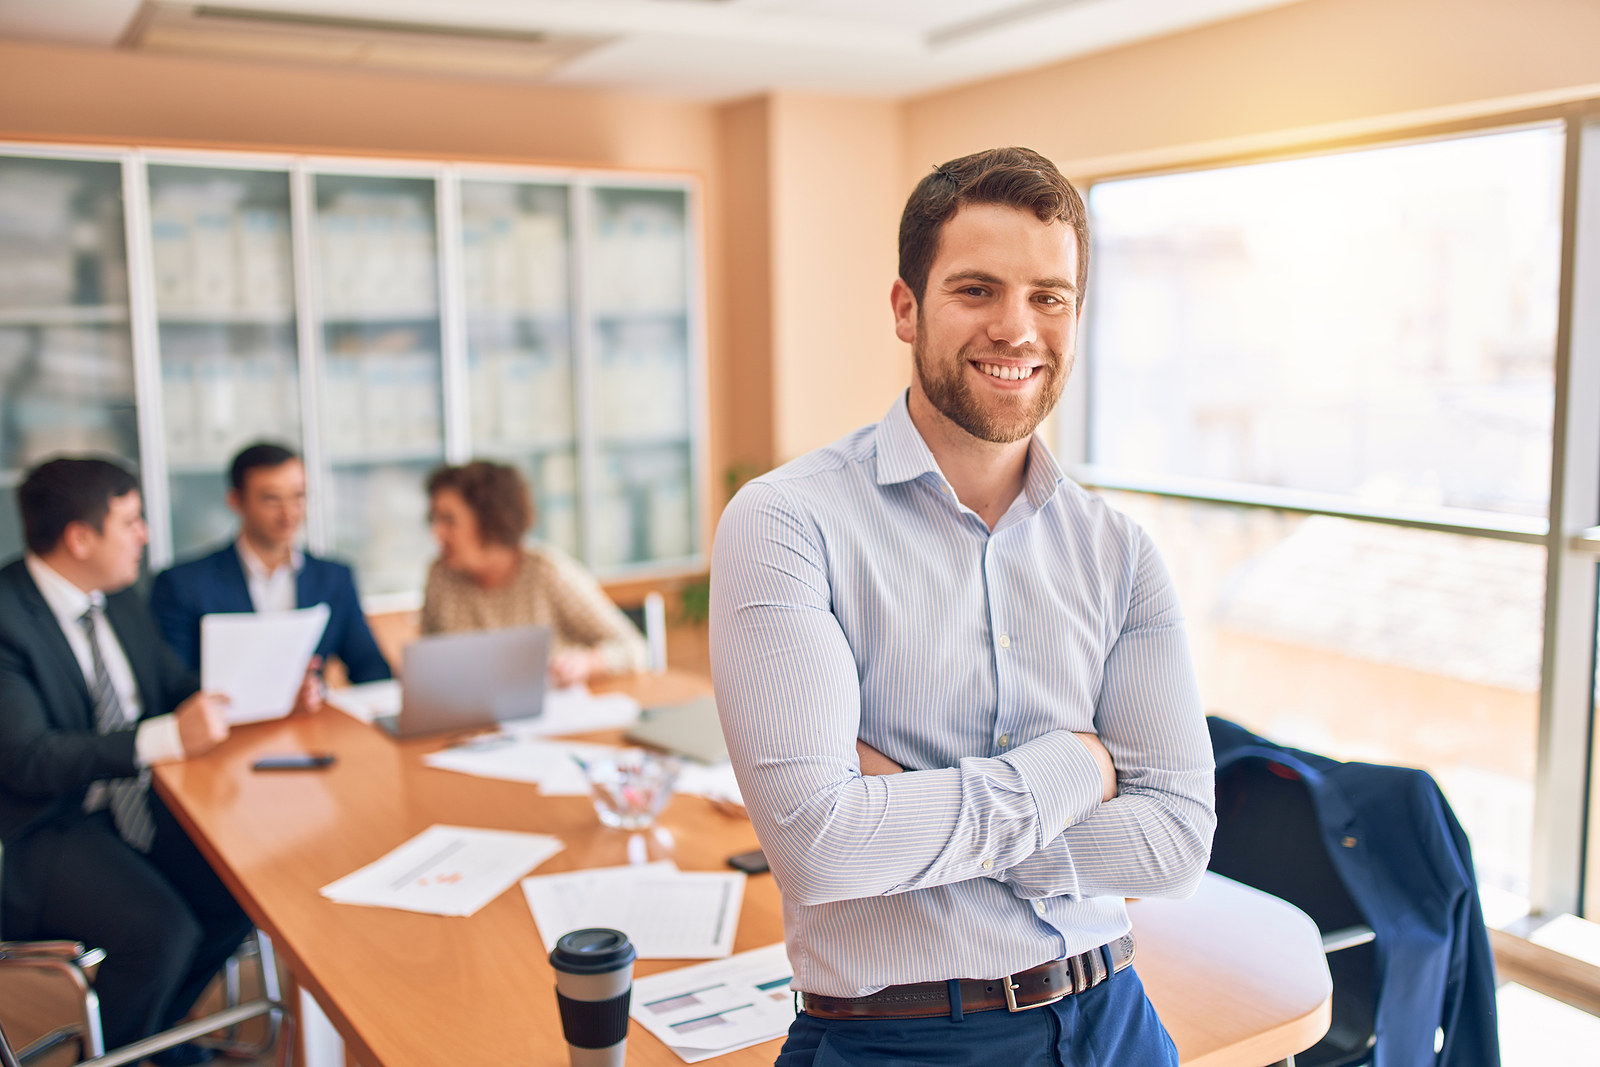 3 Excellent Ways Entrepreneurs Can Reduce Stress